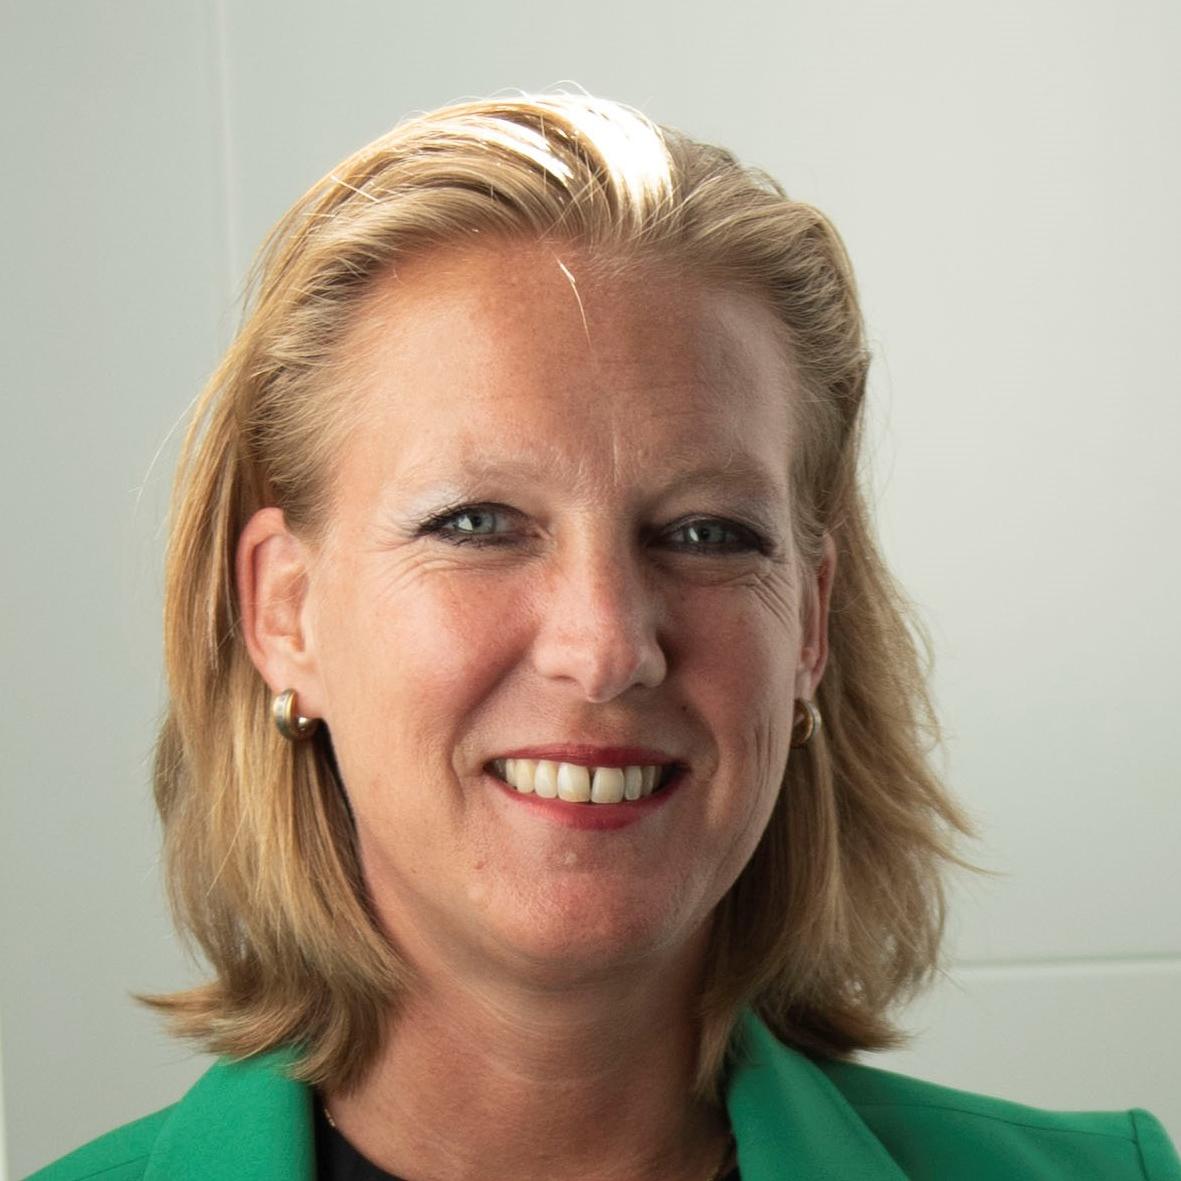 Ursula Schouten